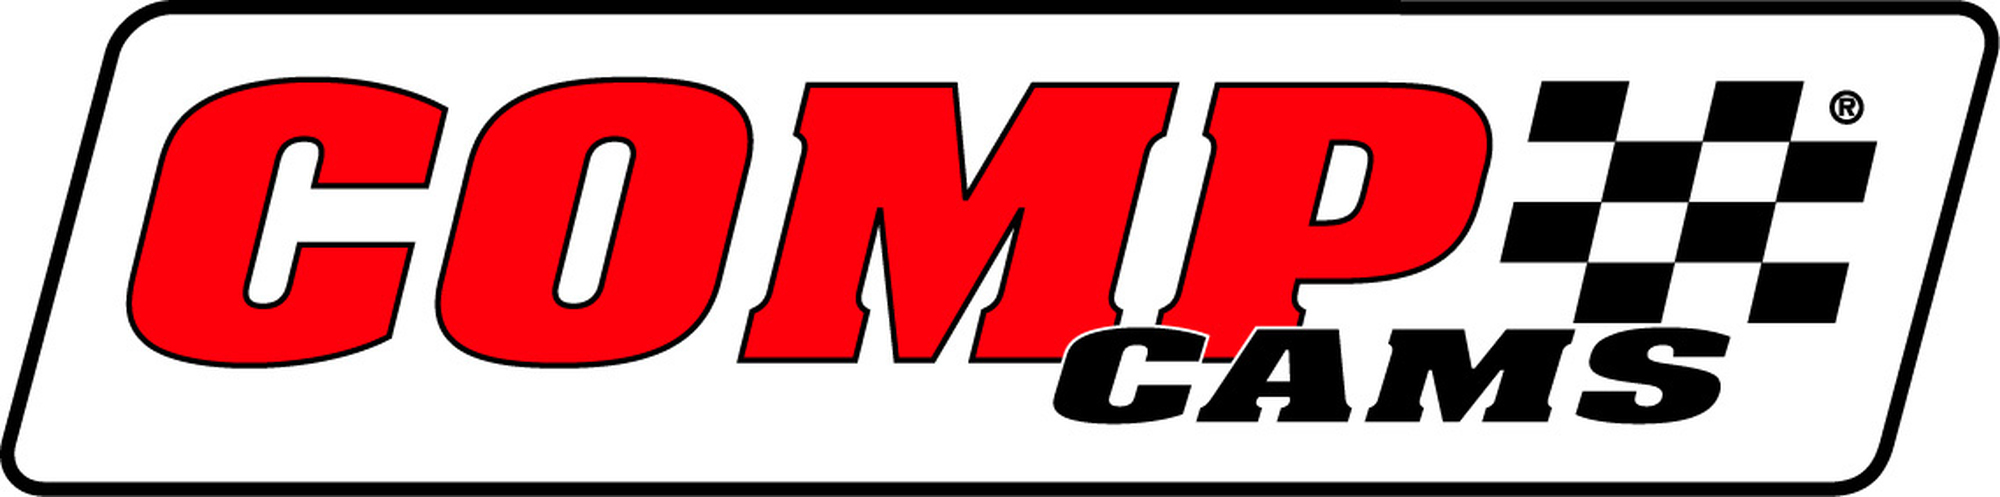 GM G3 TPX 262HR-15 COMP Cams 54-535-11 Camshaft